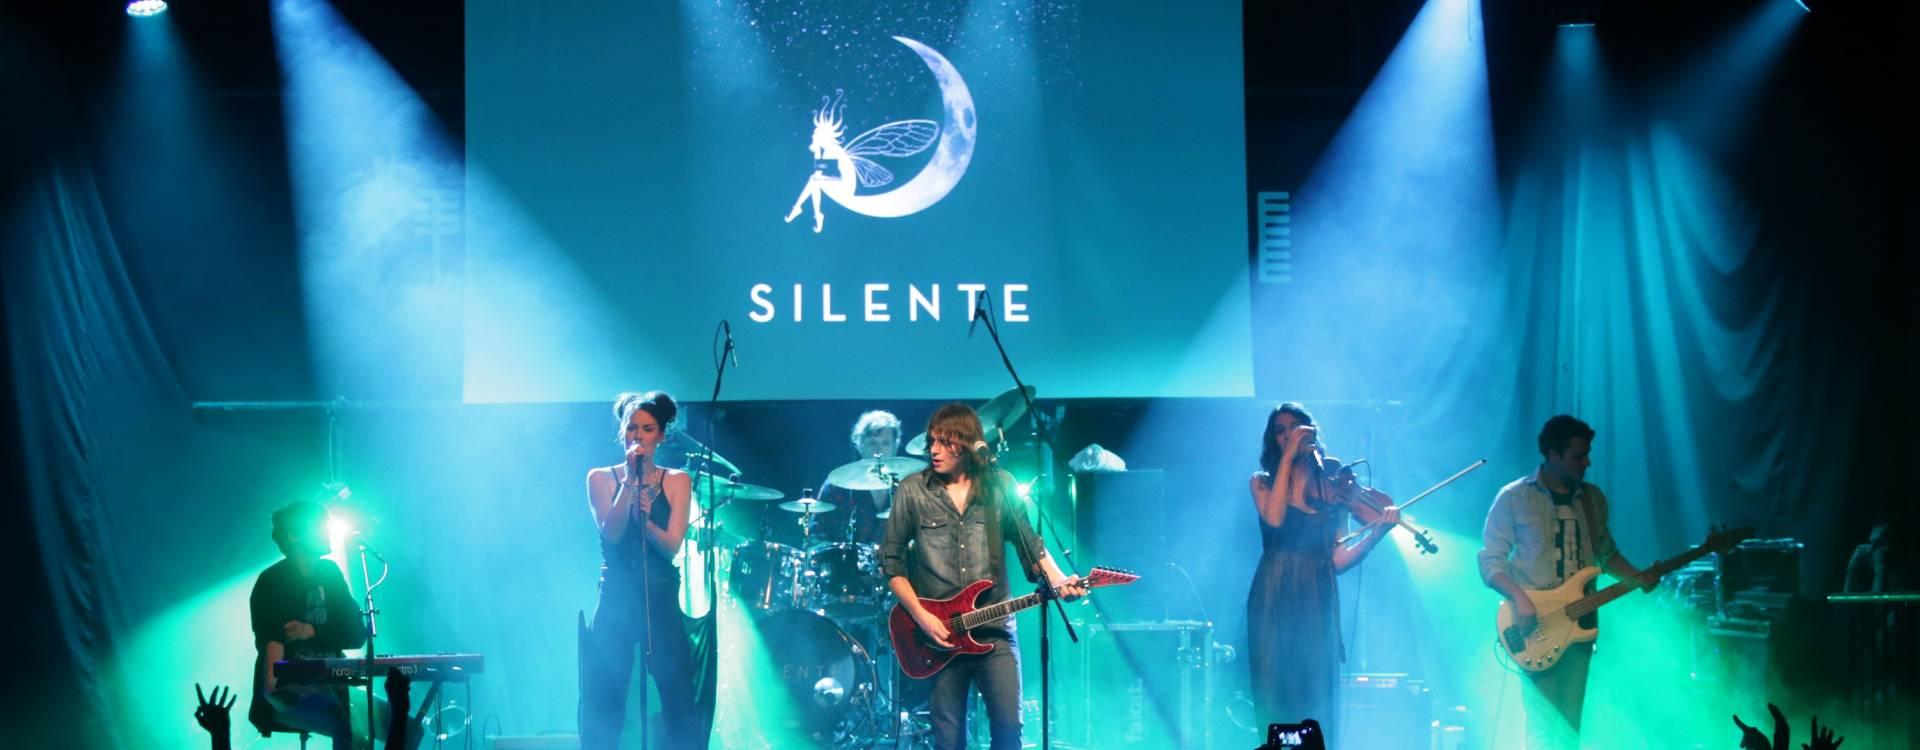 Silente – novi album dubrovačke grupe